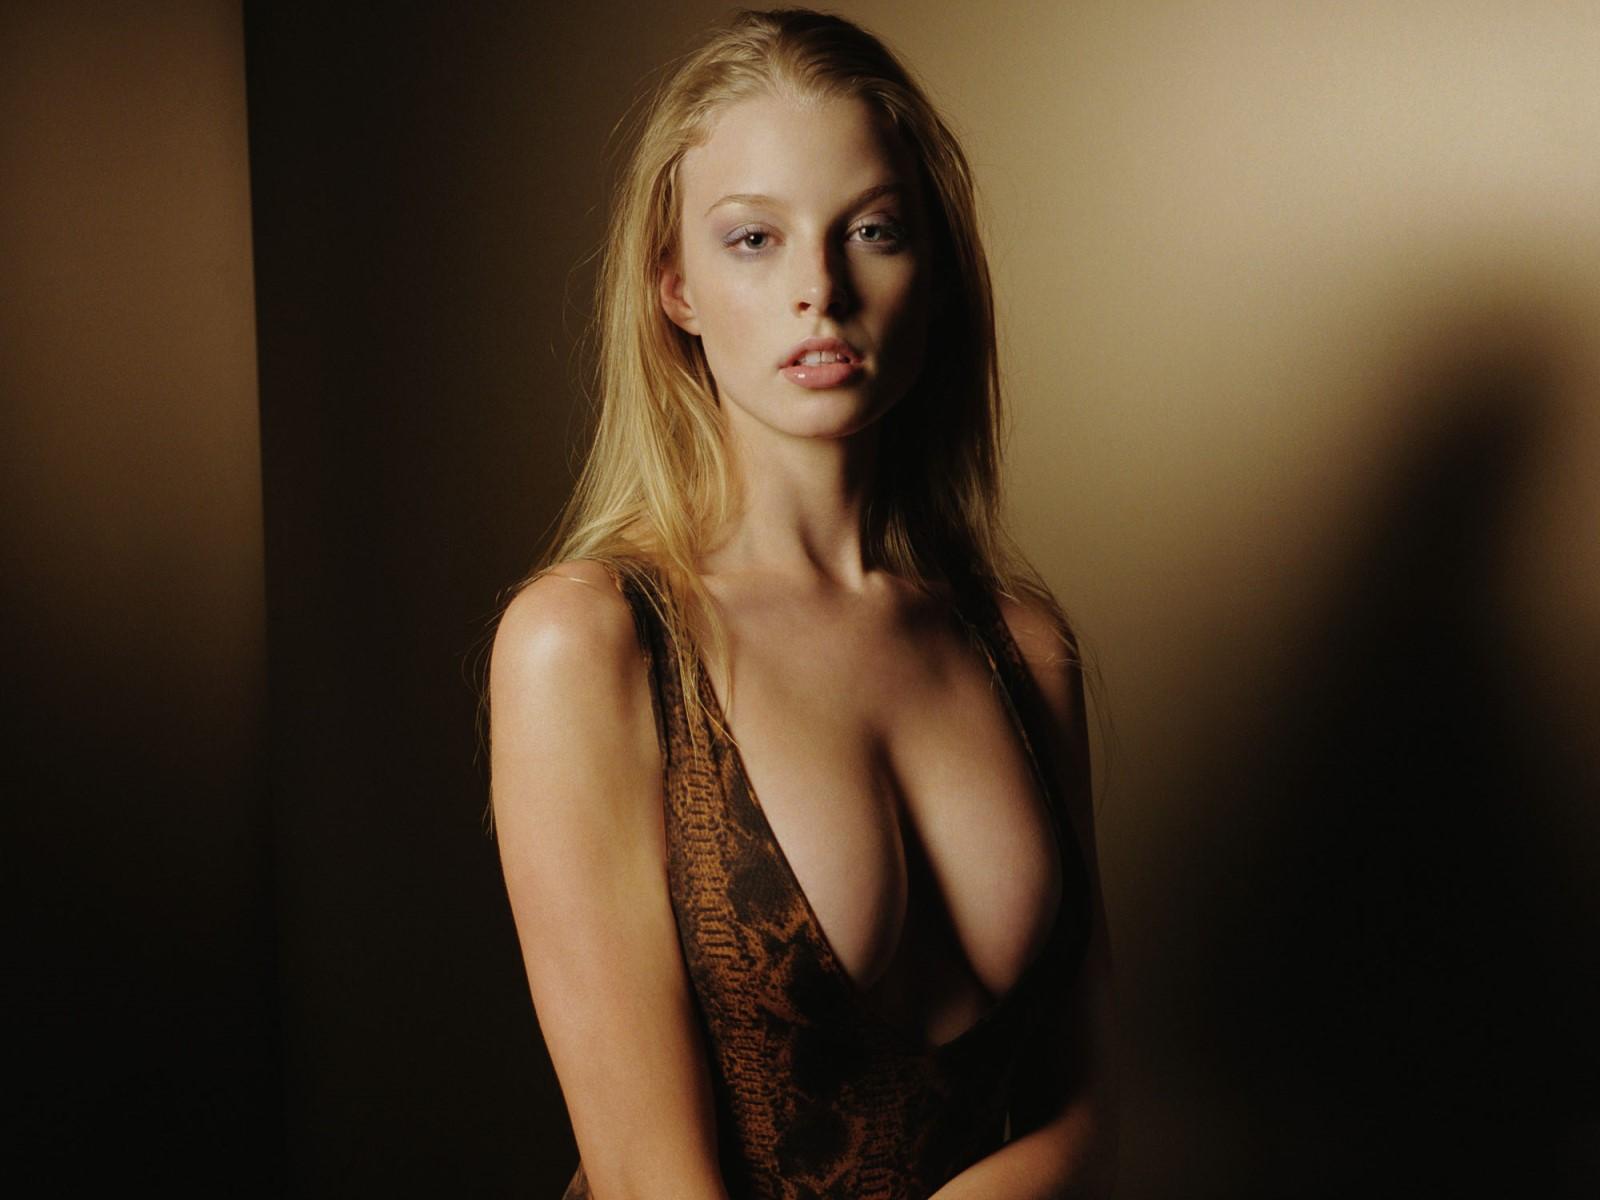 adult men sucking nude breast